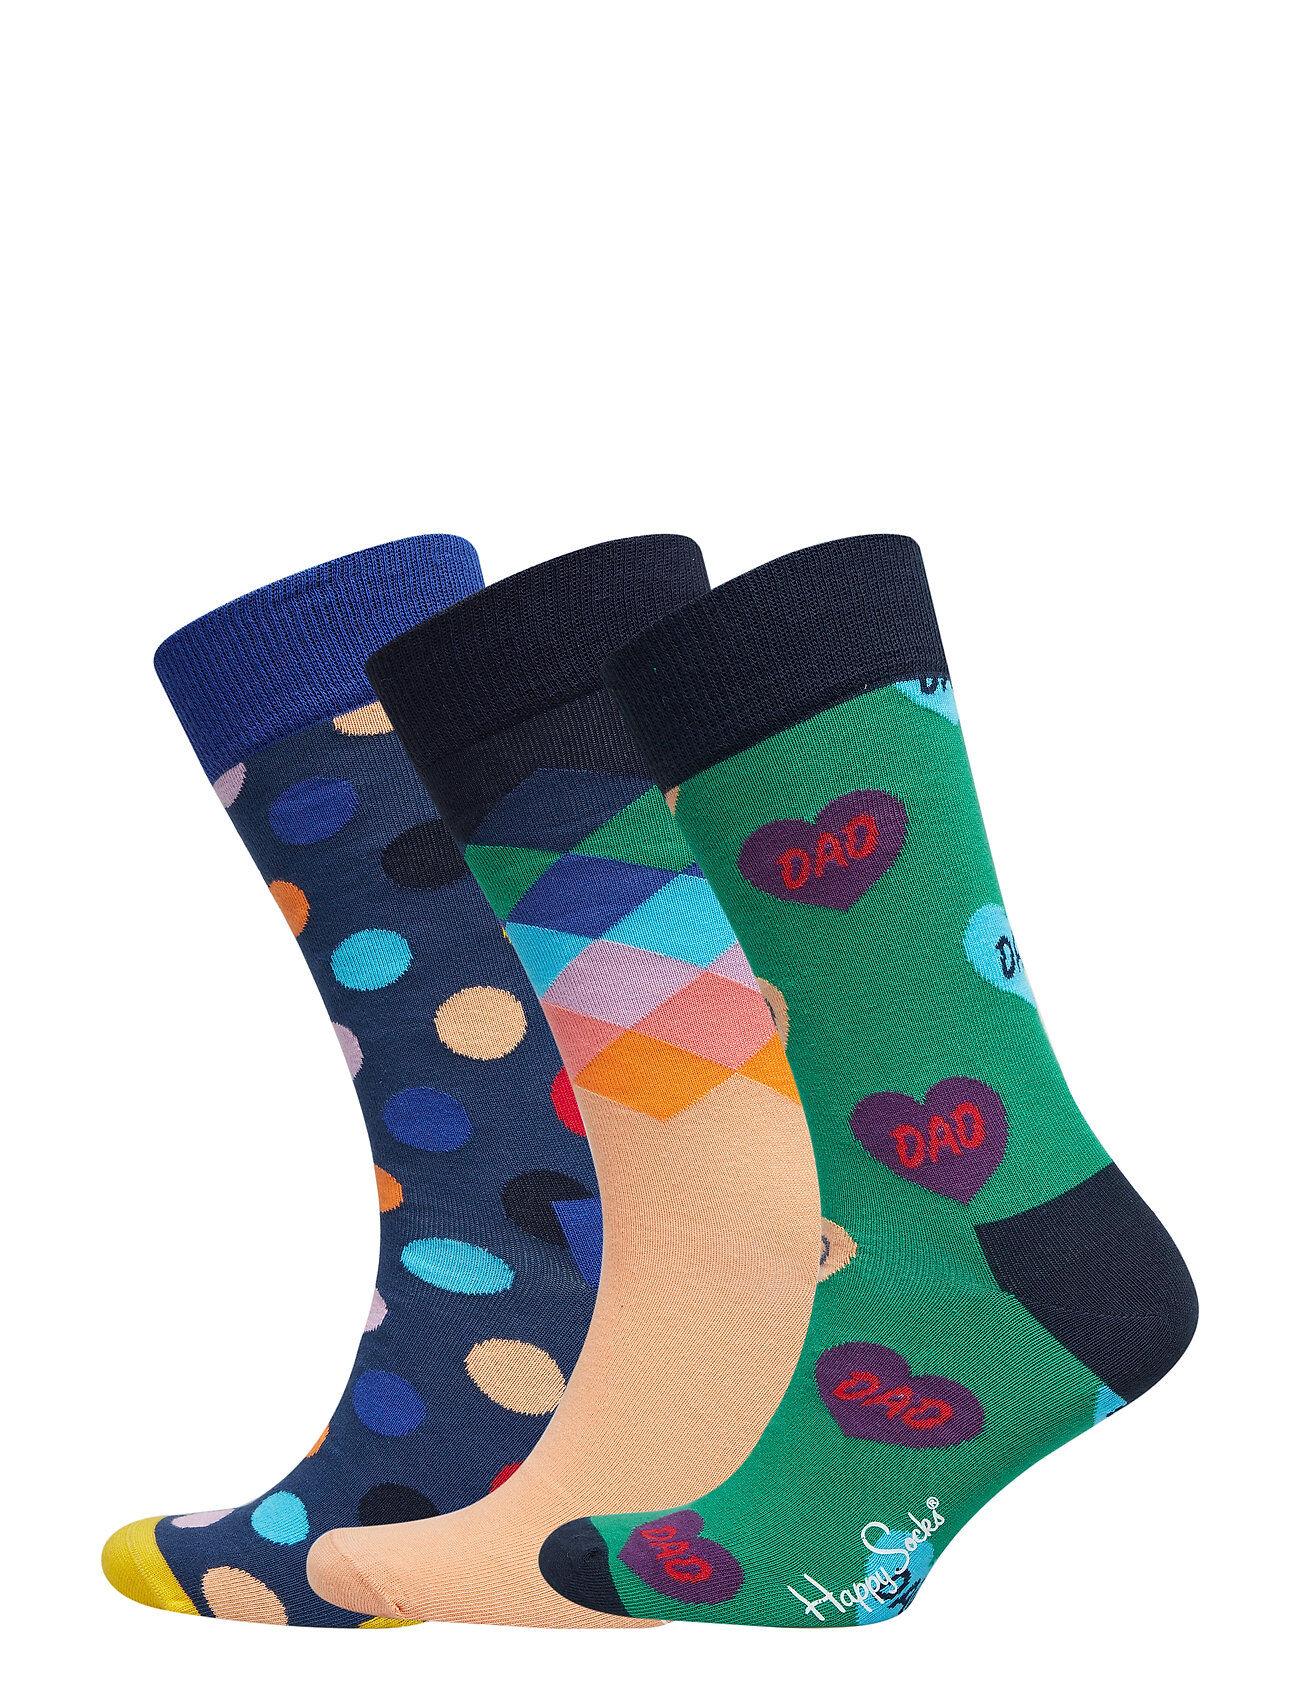 Happy Socks Father